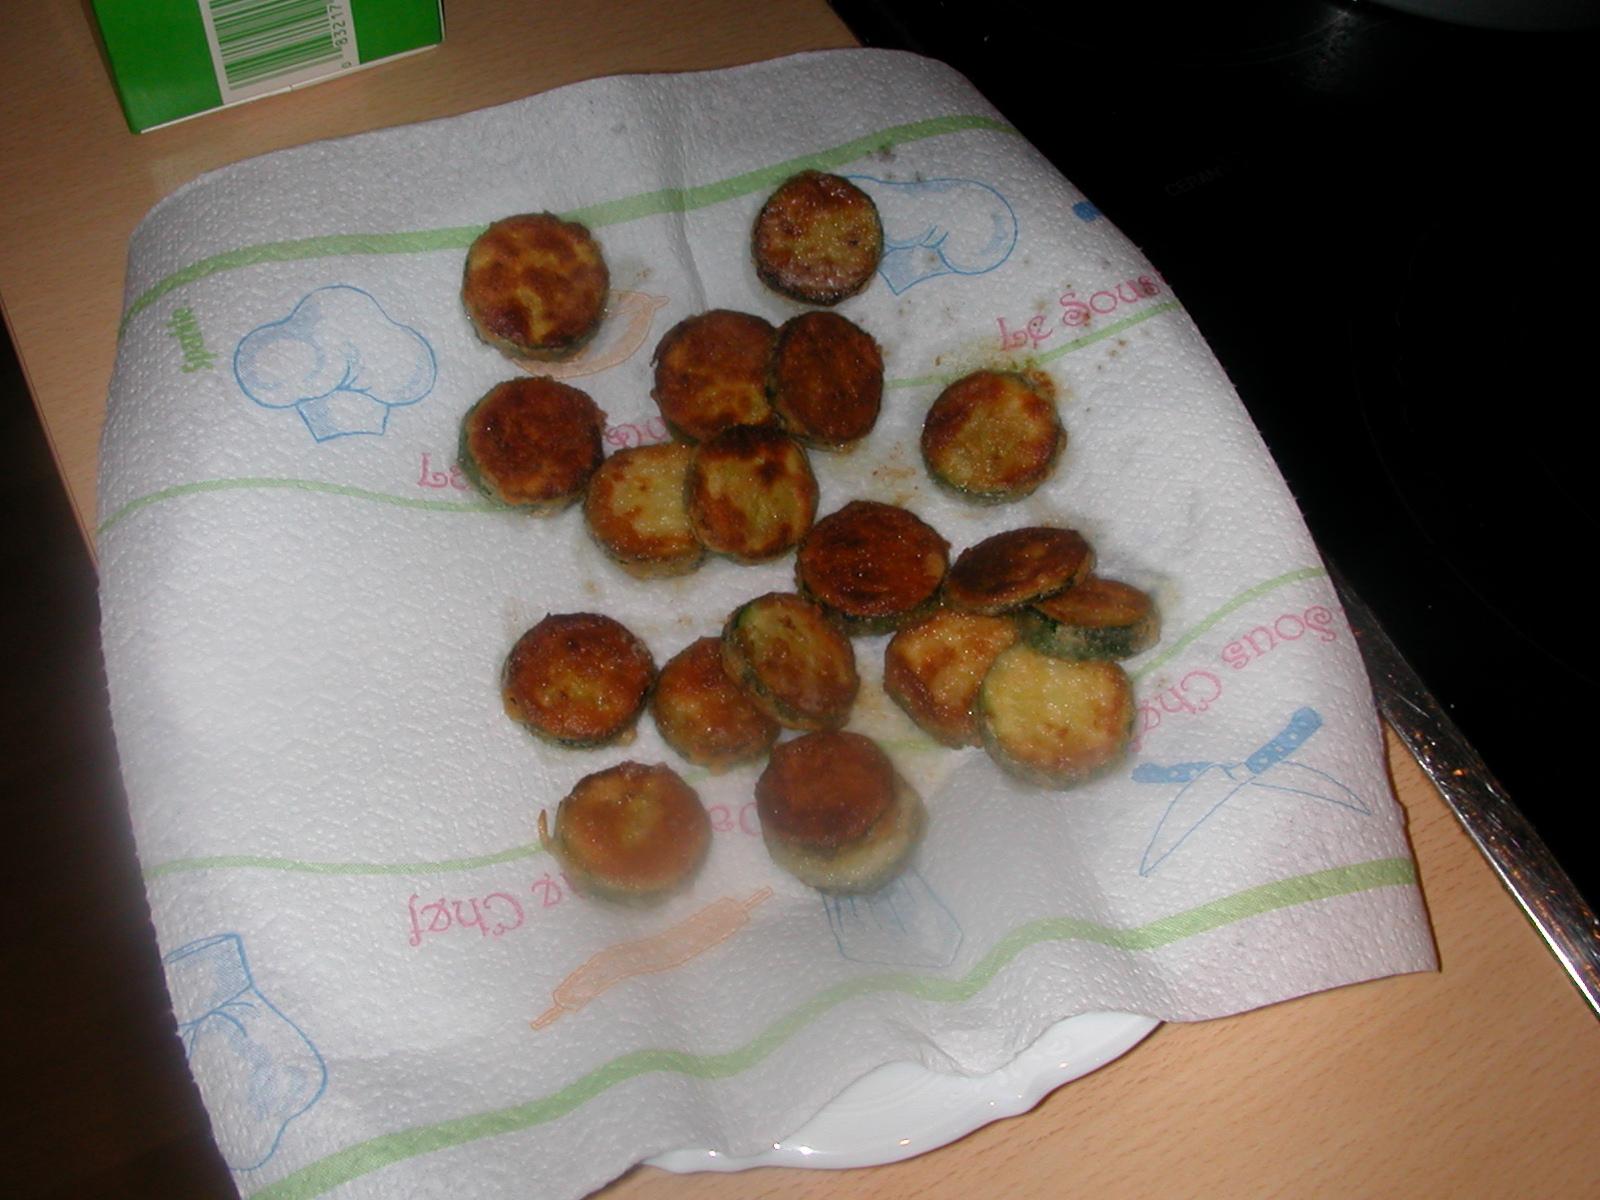 How To Make Fried Zucchini